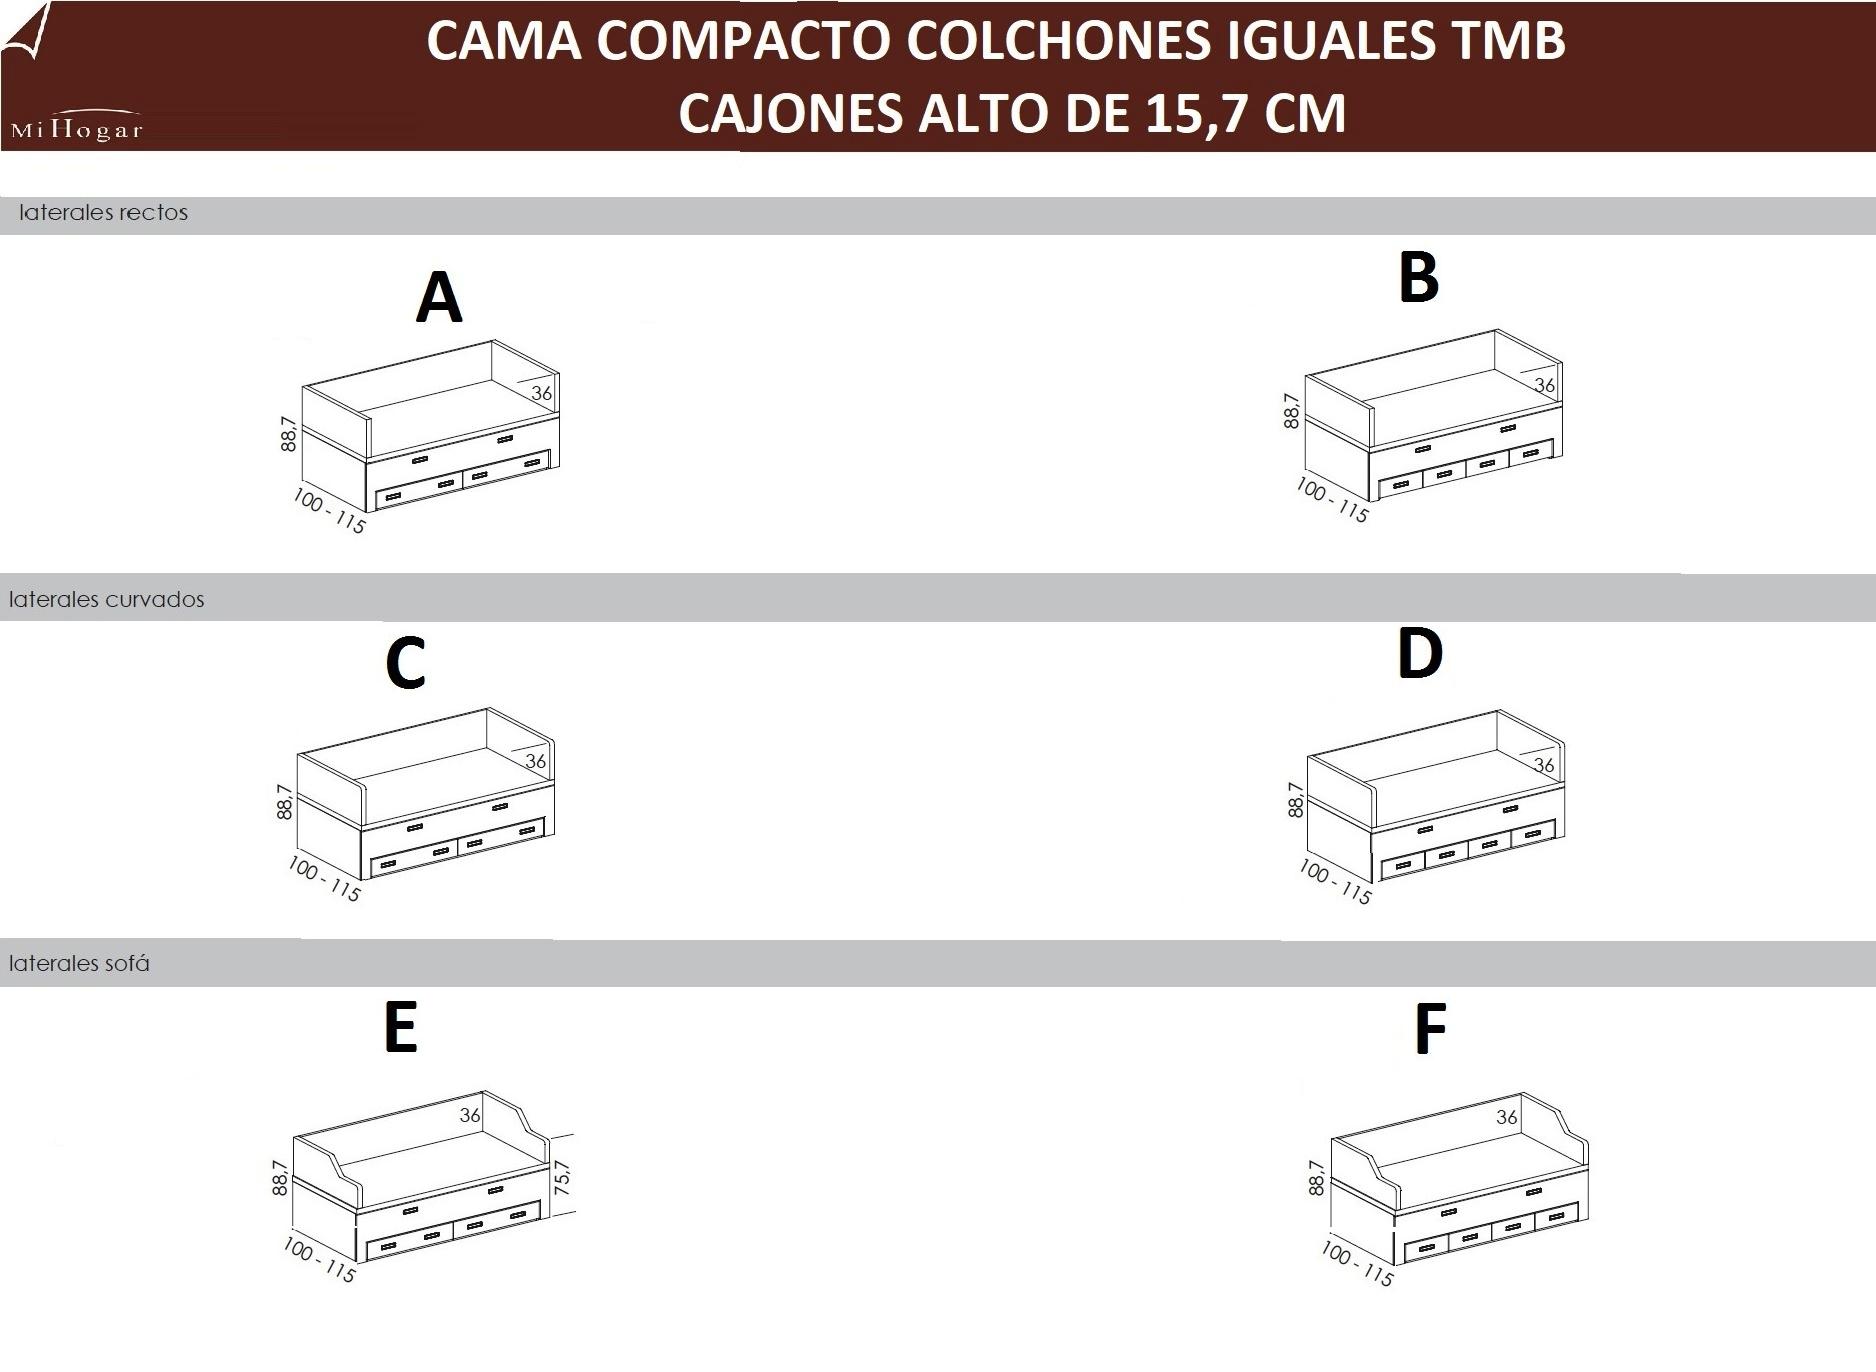 CAMA COMPACTO COLCHONES IGUALES TMB | MUEBLES MI HOGAR